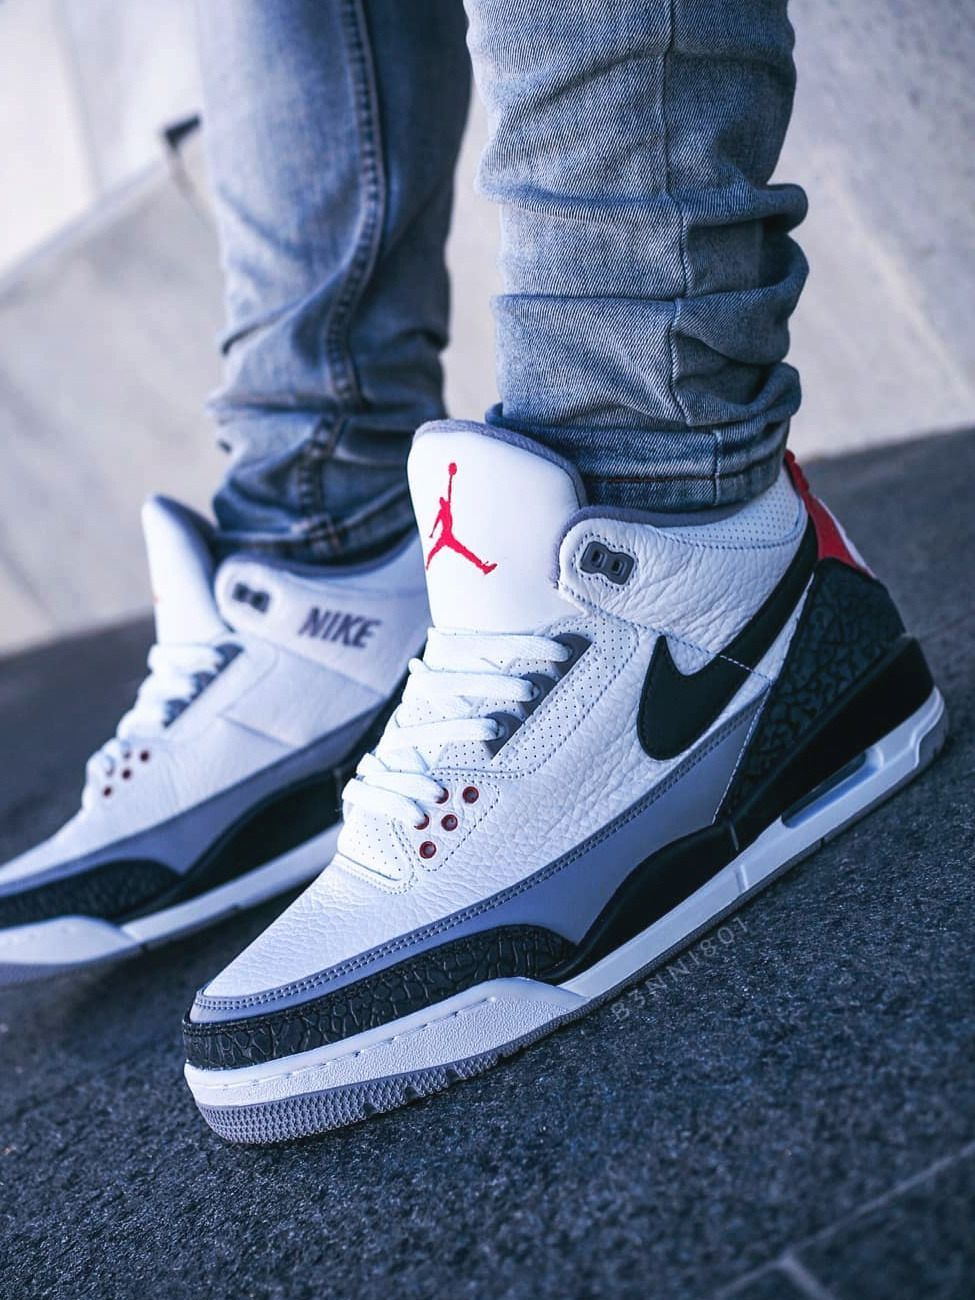 nike air jordan - Nike Shoes #jordan #nike #NikeShoes   Nike shoes ...